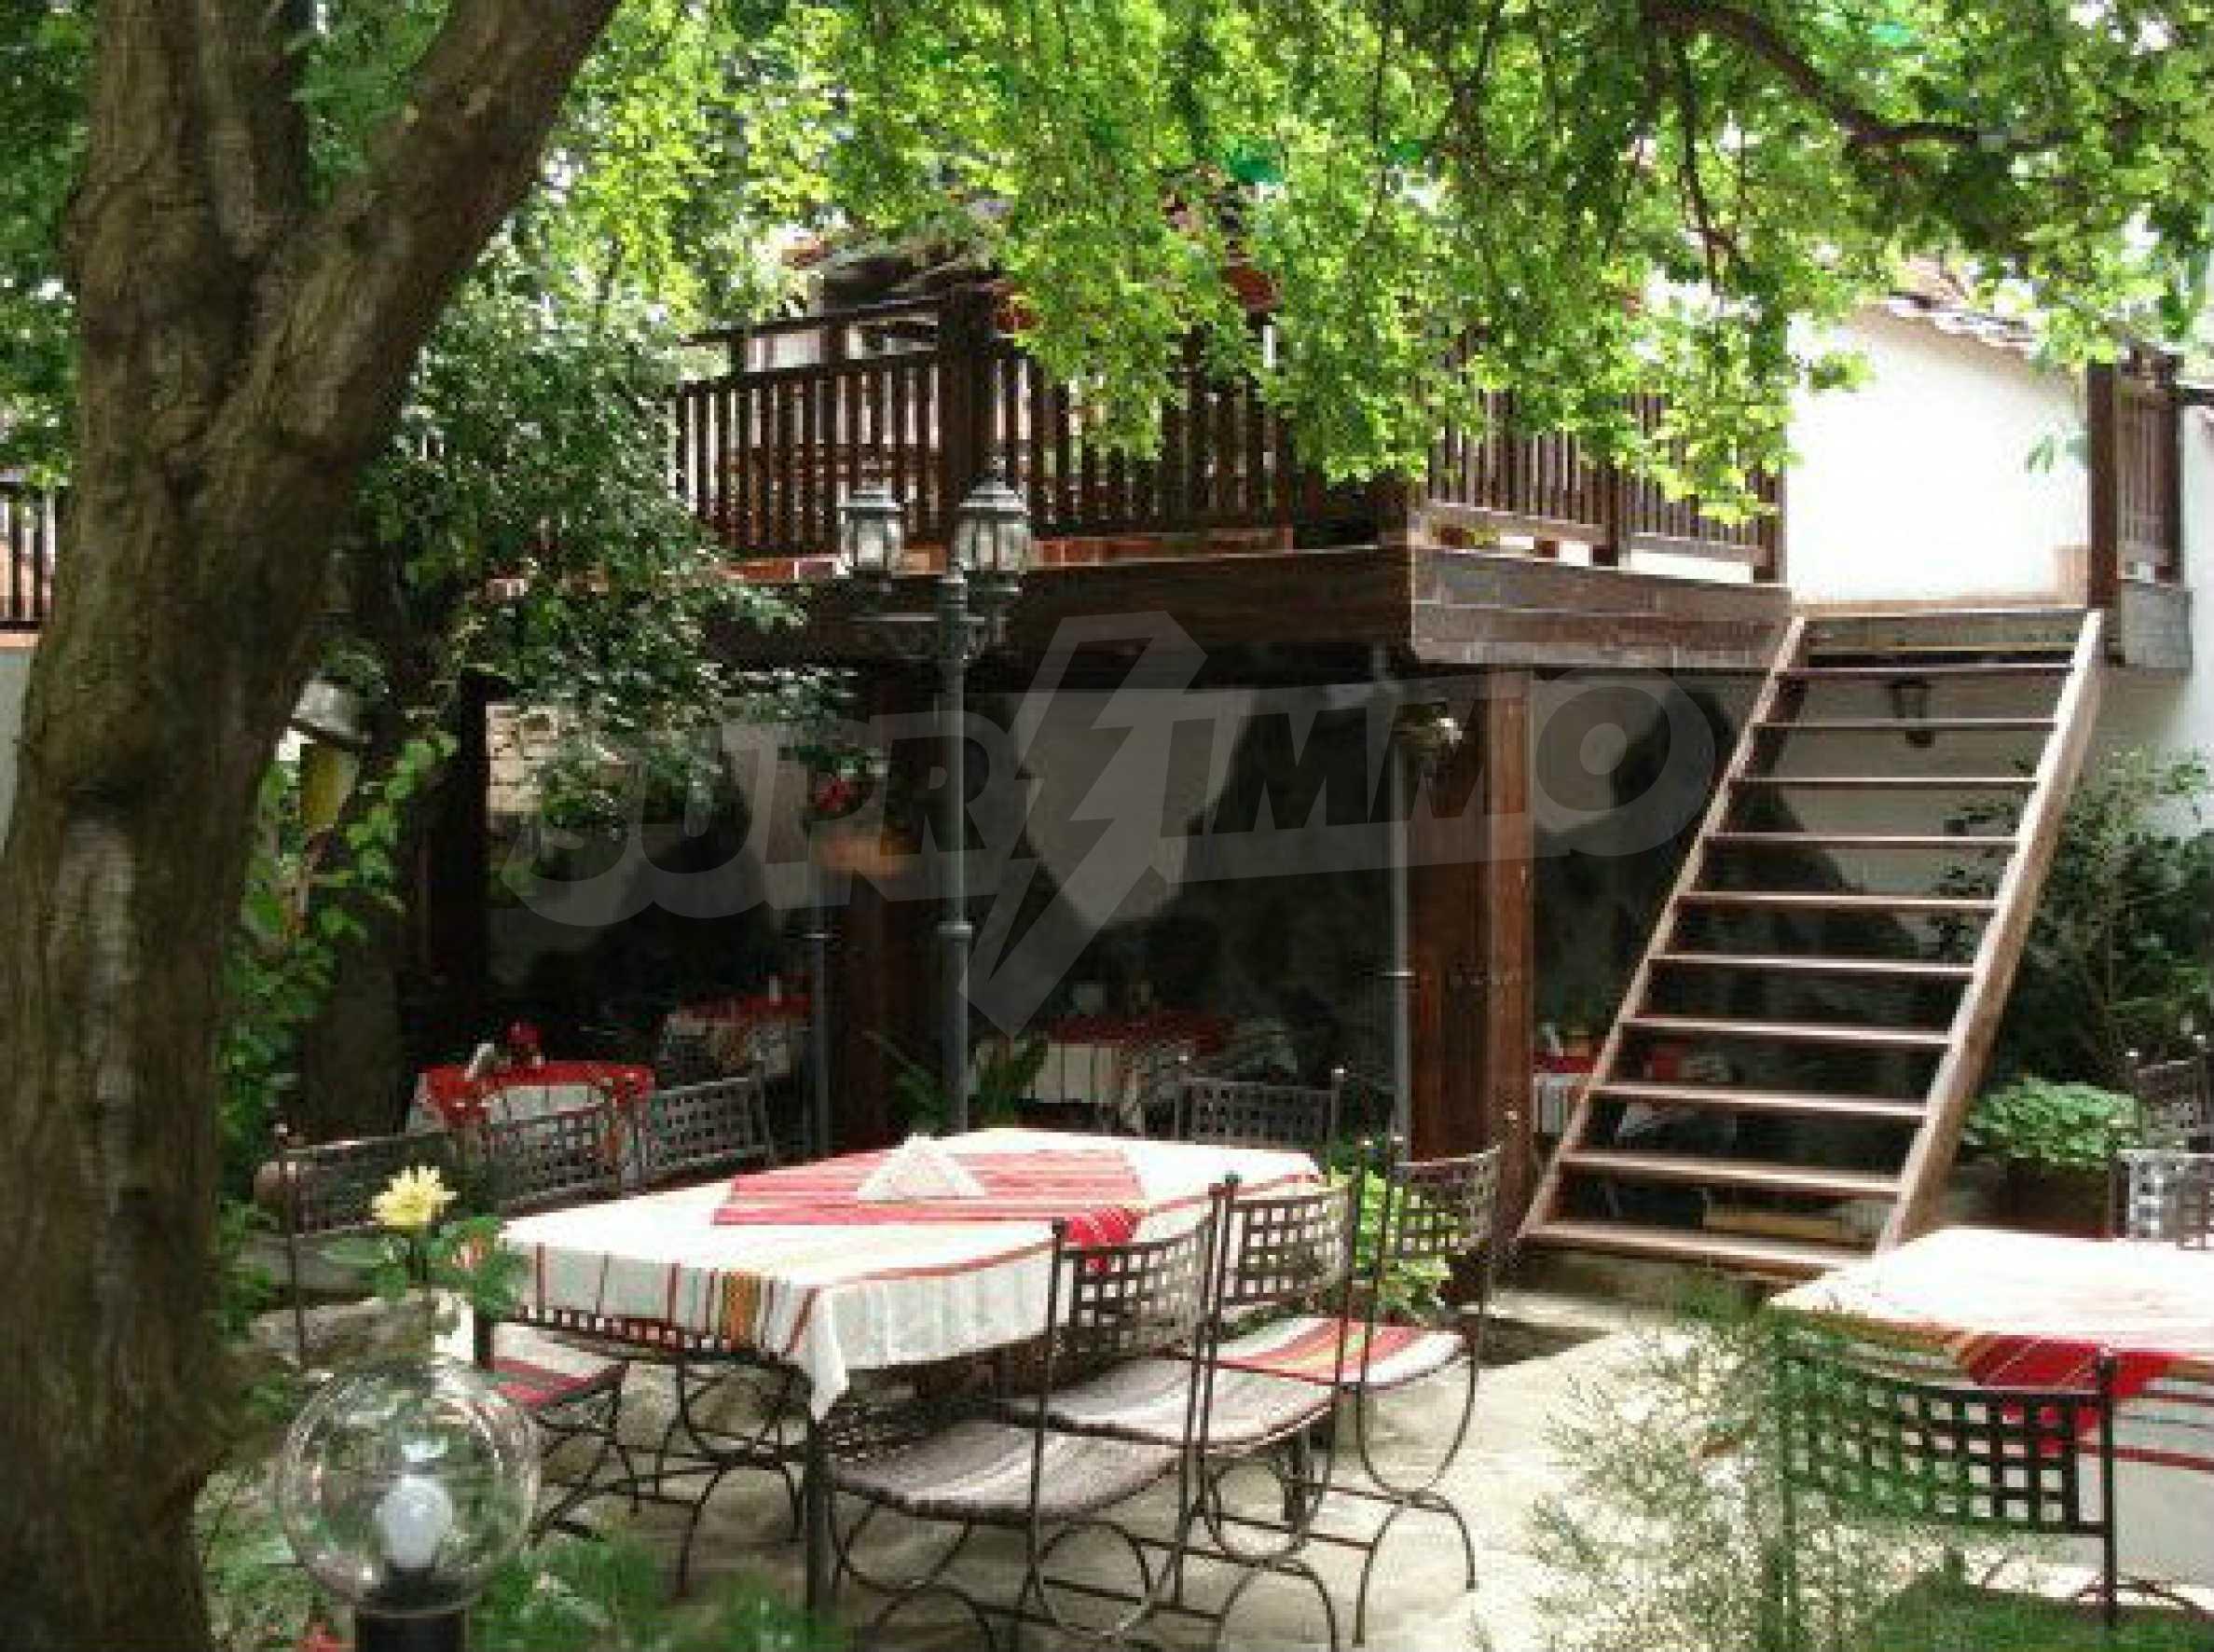 Hotelanlage mit Restaurant am Ufer des Flusses Osam in Lovech 51